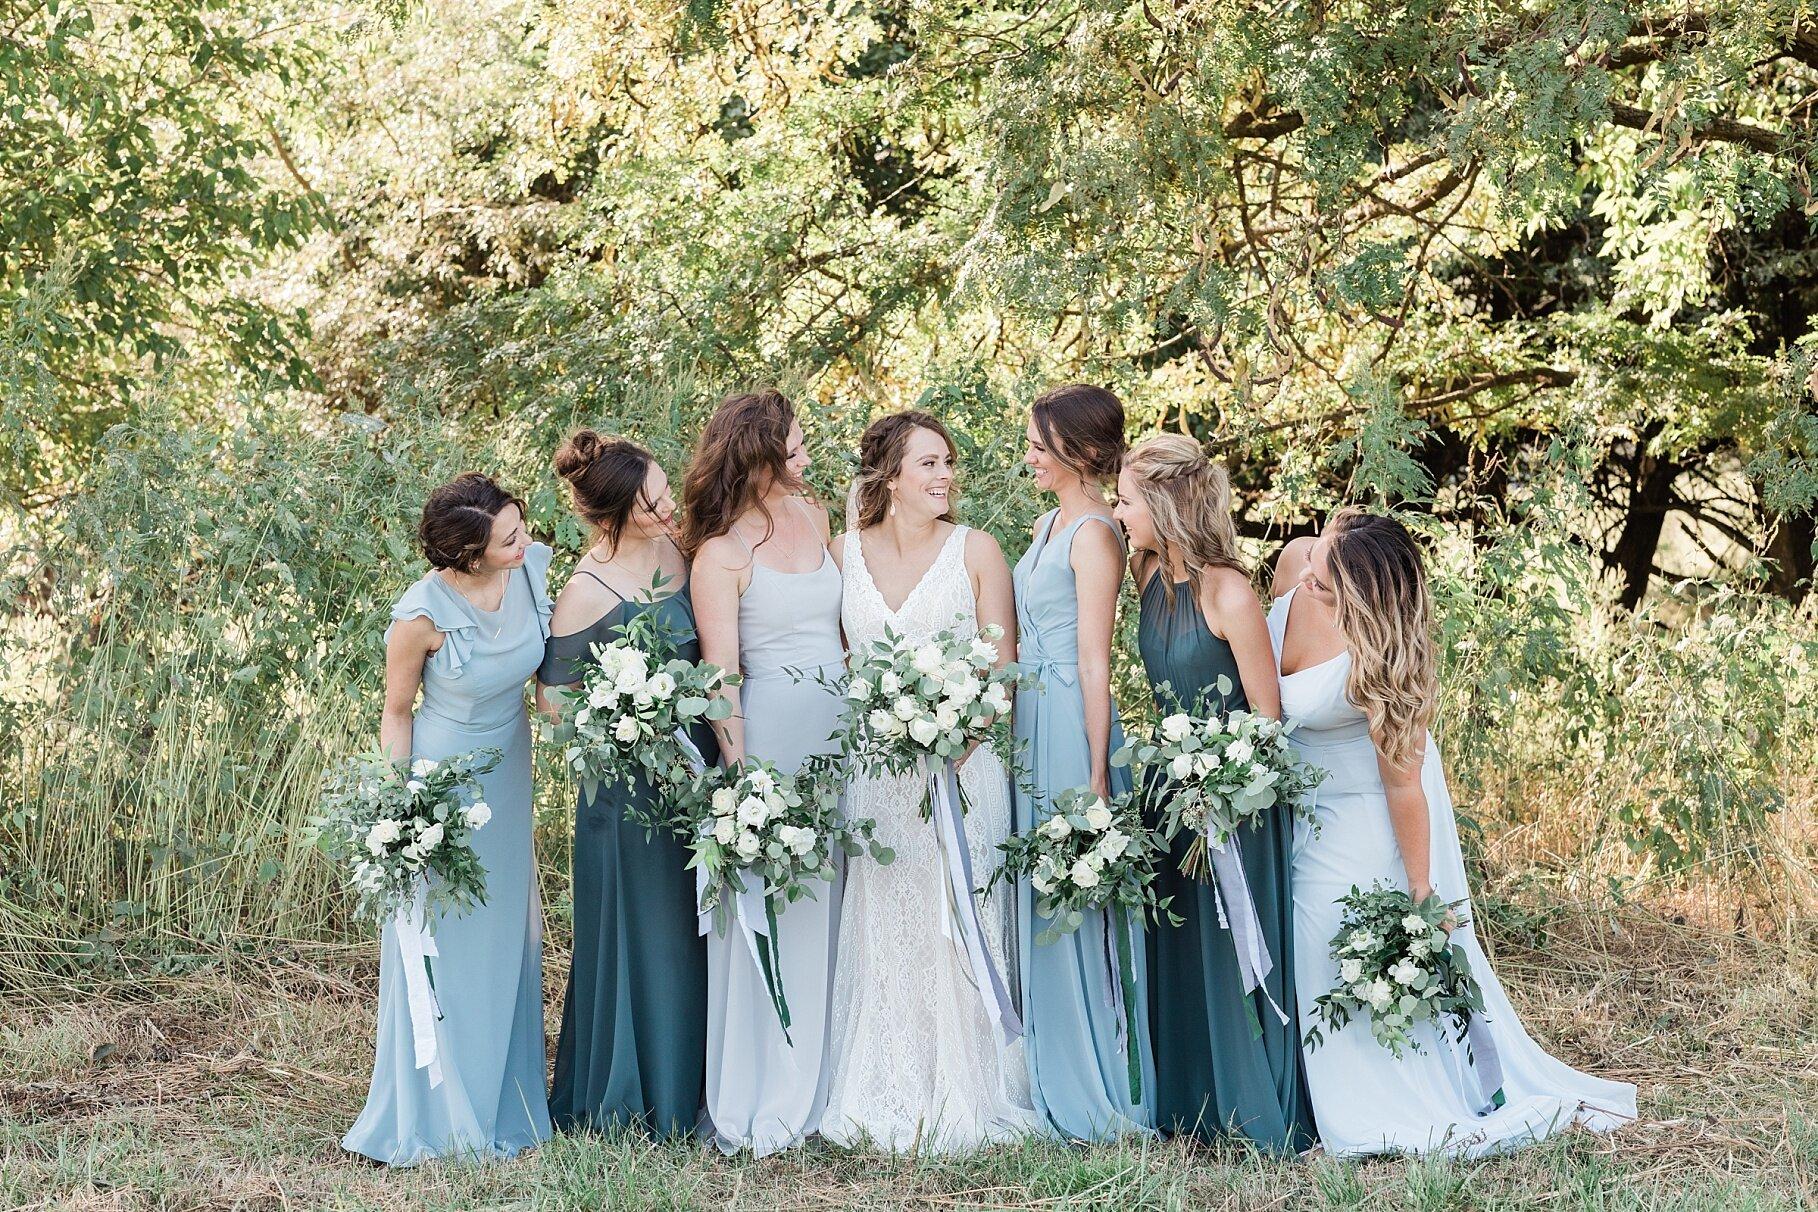 Earth-Toned Wedding by KKP Associate Wedding Photographer and Kelsi Kliethermes Photography Best Columbia Missouri Wedding Photographer_0008.jpg